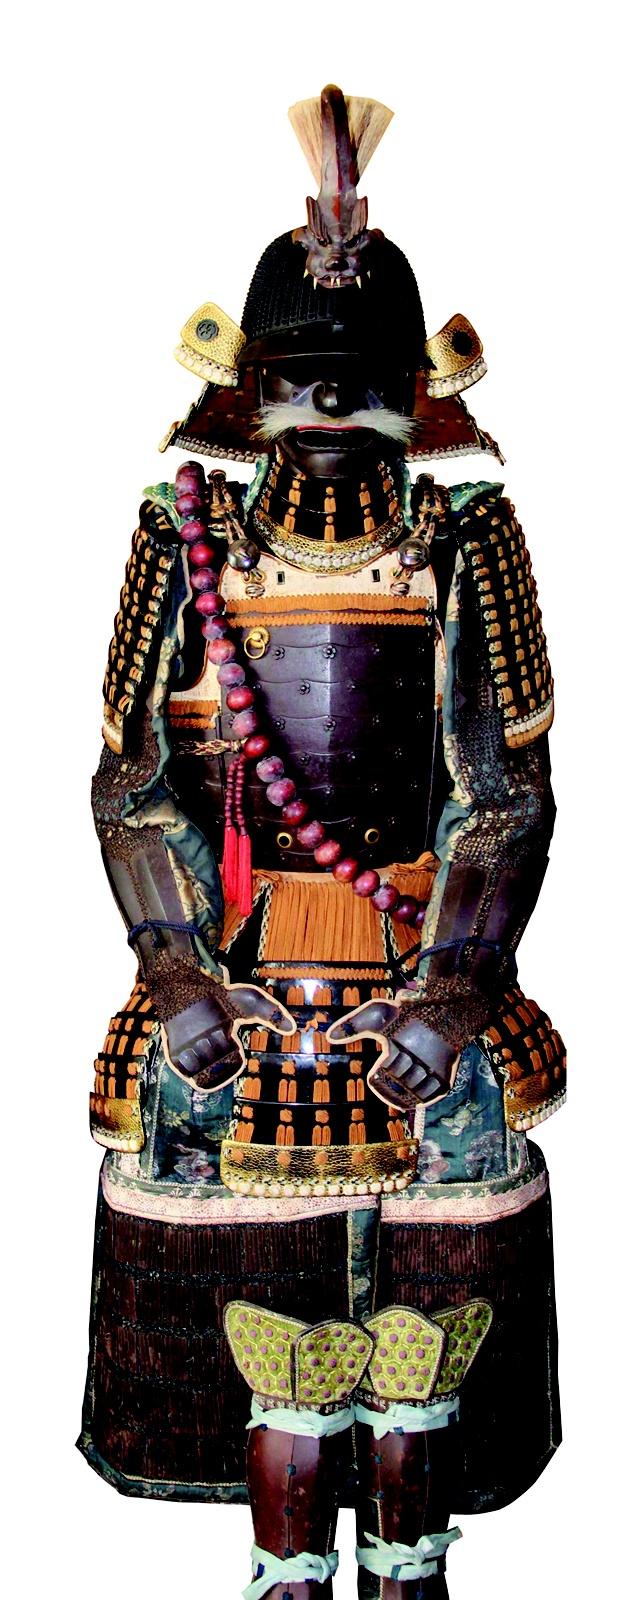 Armure samouraï.   Collection Richard Béliveau, photos : © Alain Lefort.